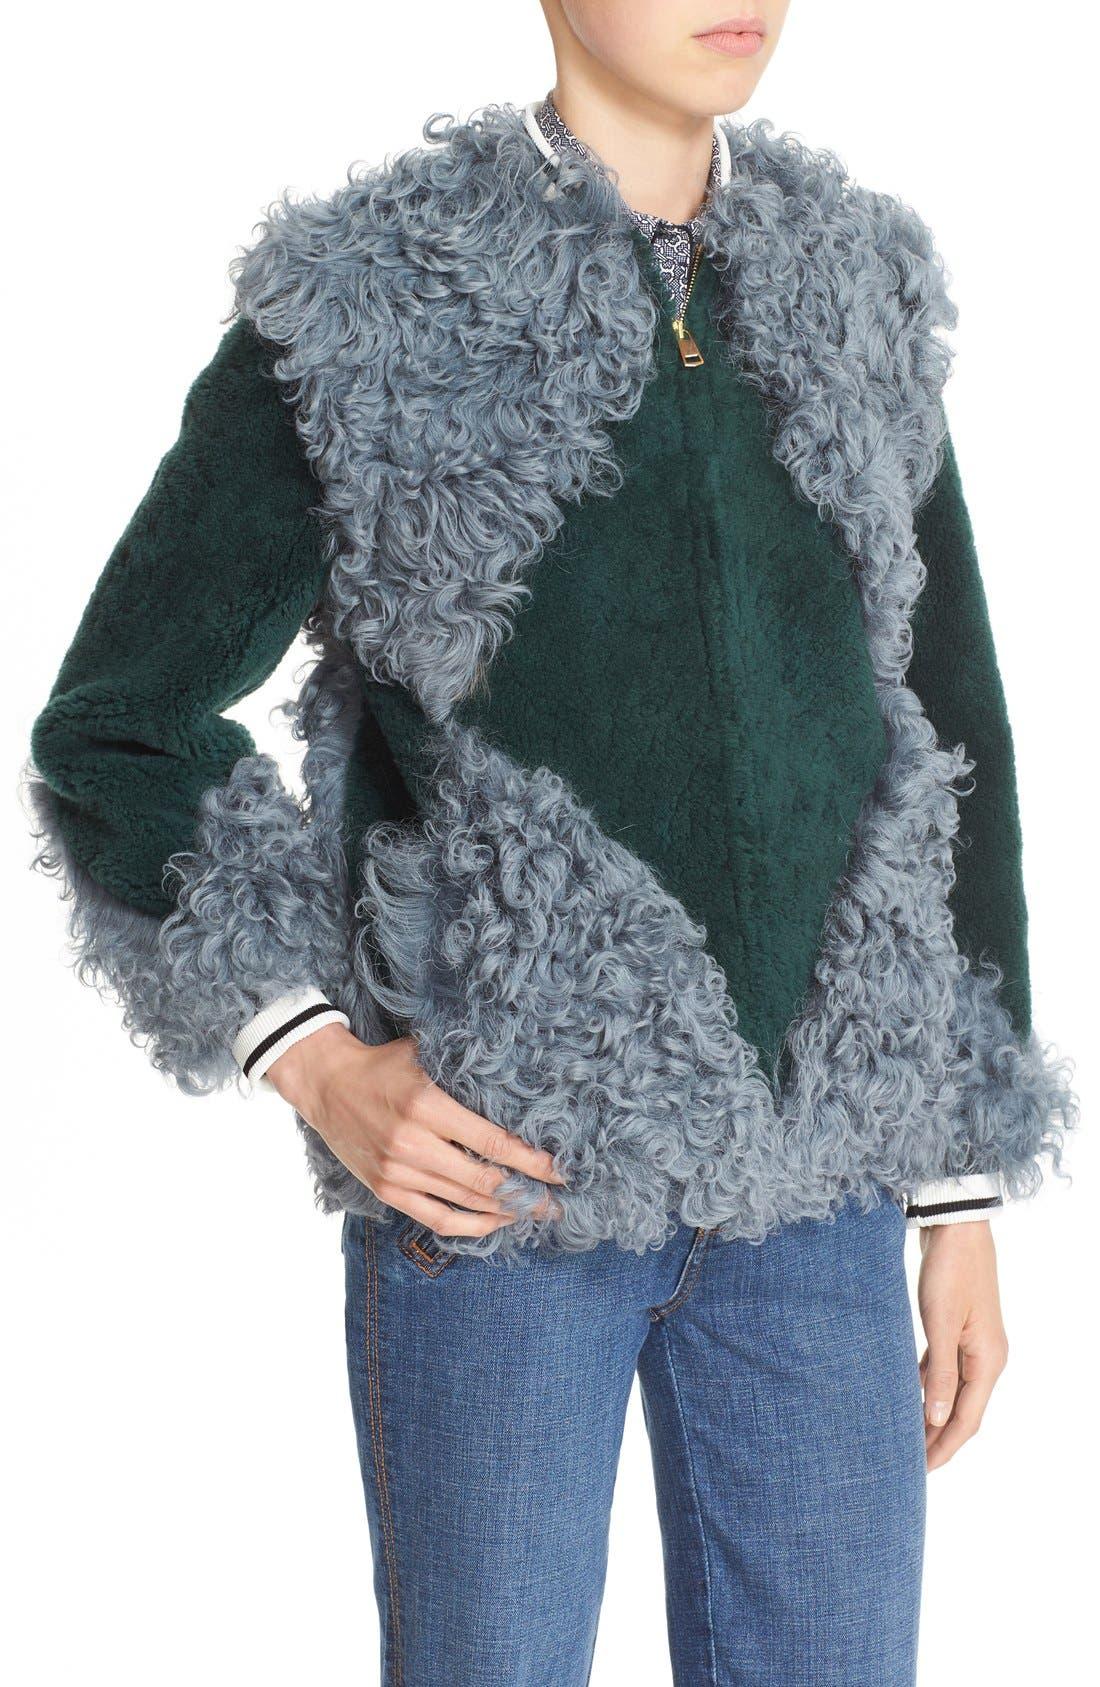 'Bristol' Colorblock Genuine Shearling Jacket,                             Alternate thumbnail 4, color,                             318